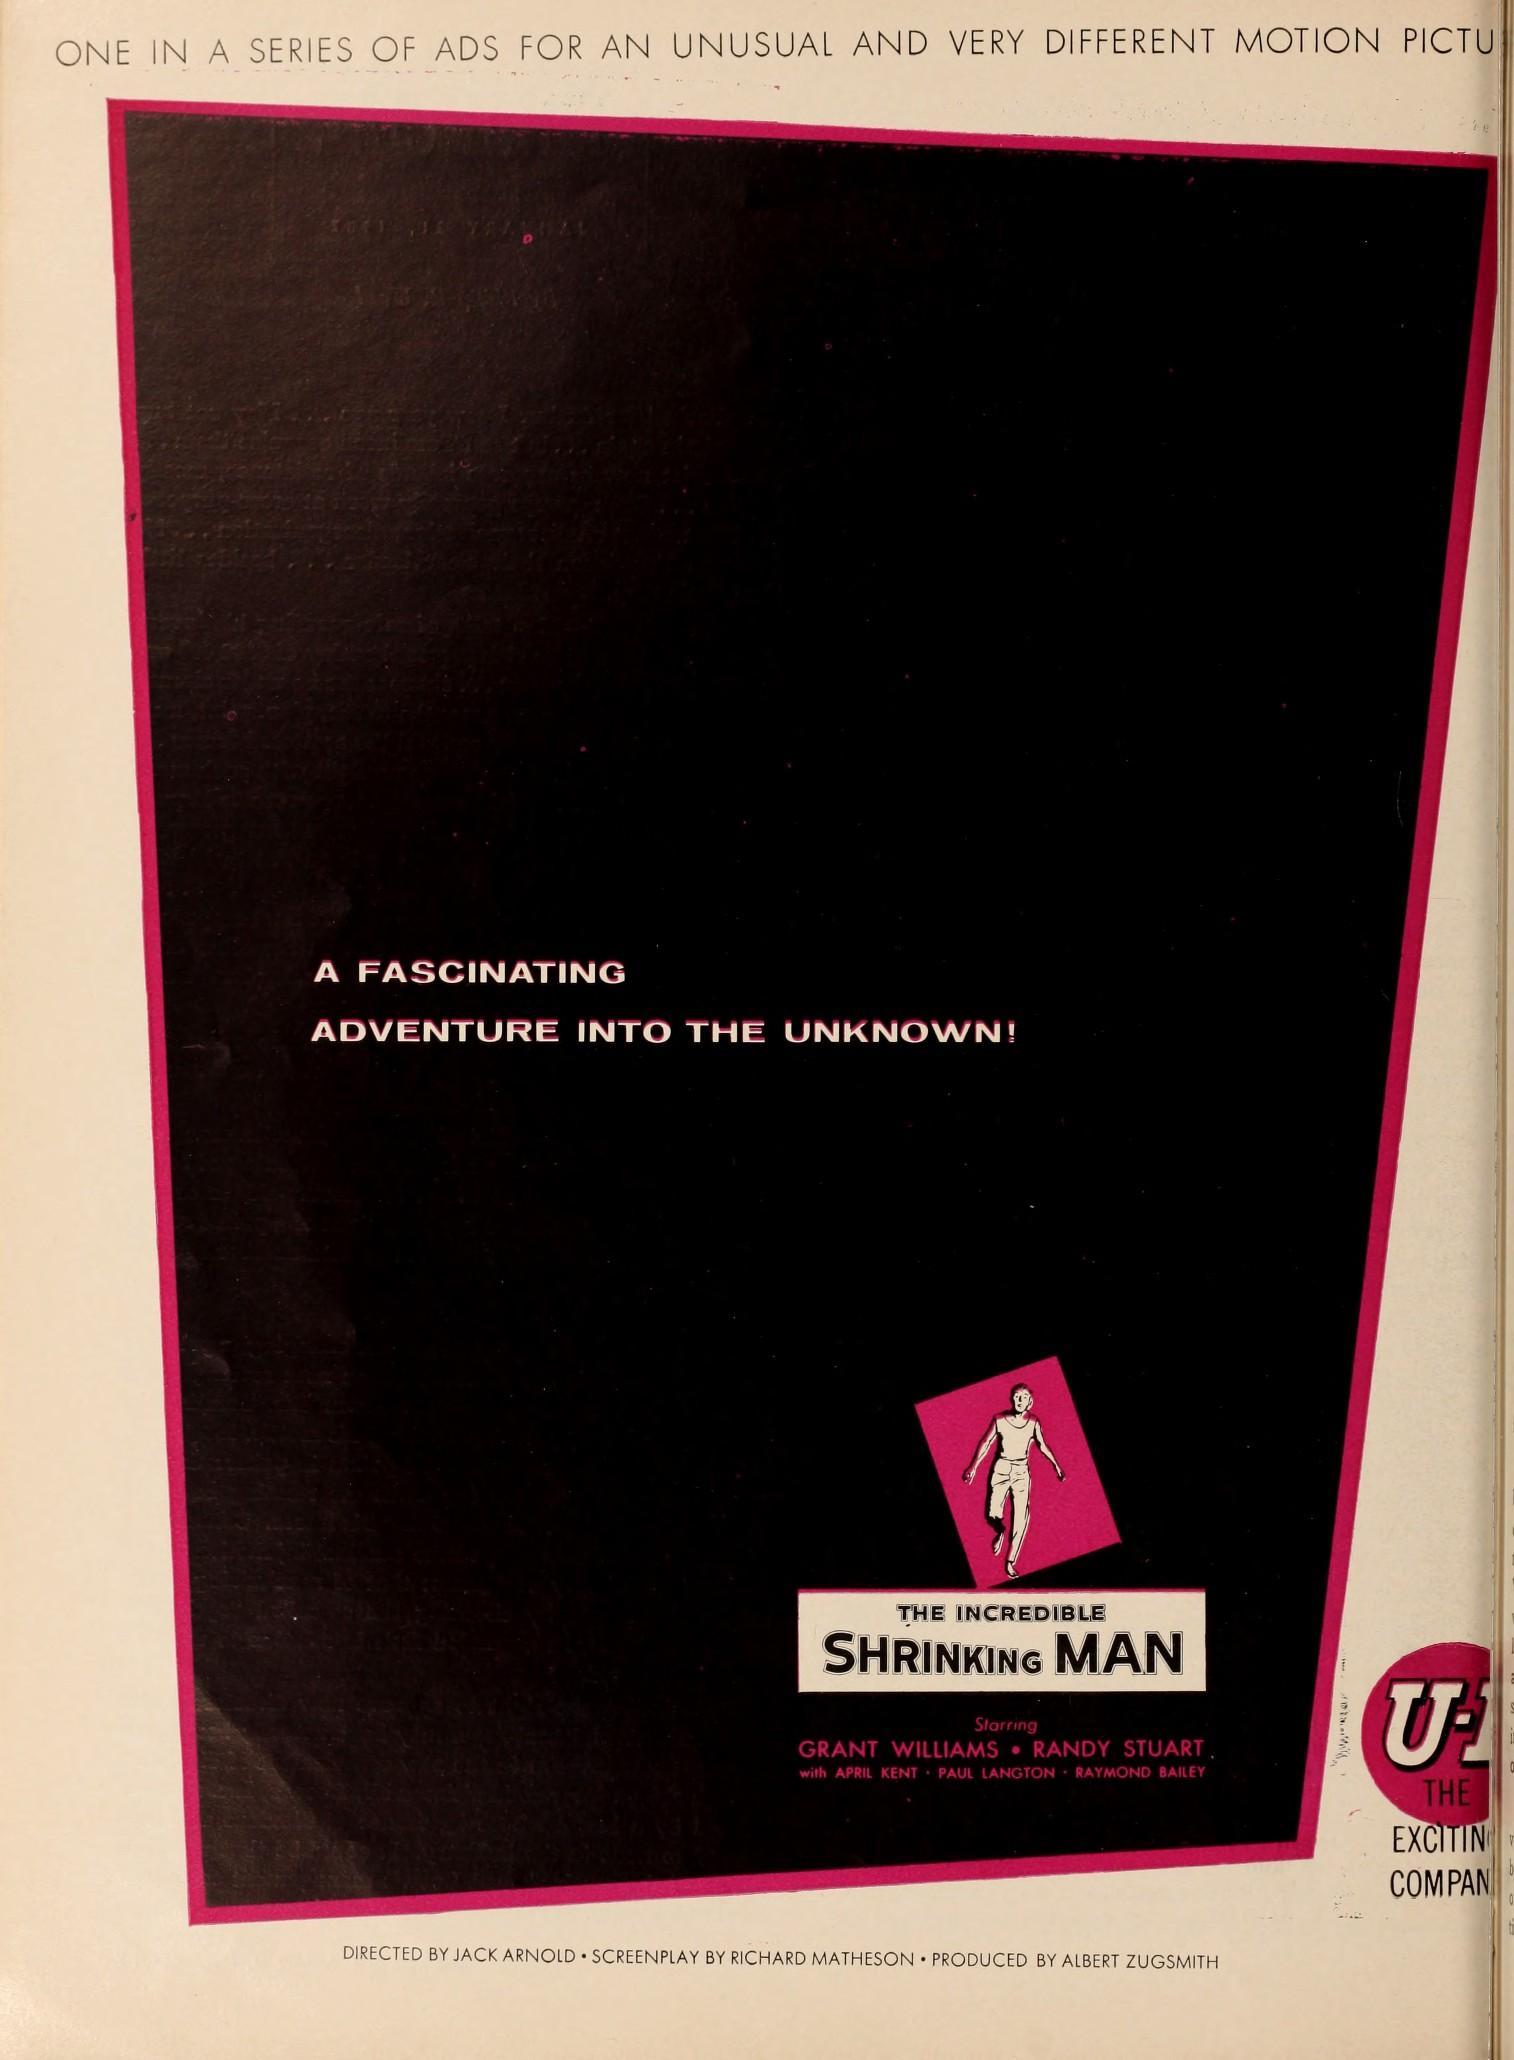 Filmbulletin195725film_jp2.zip&file=filmbulletin195725film_jp2%2ffilmbulletin195725film_0038